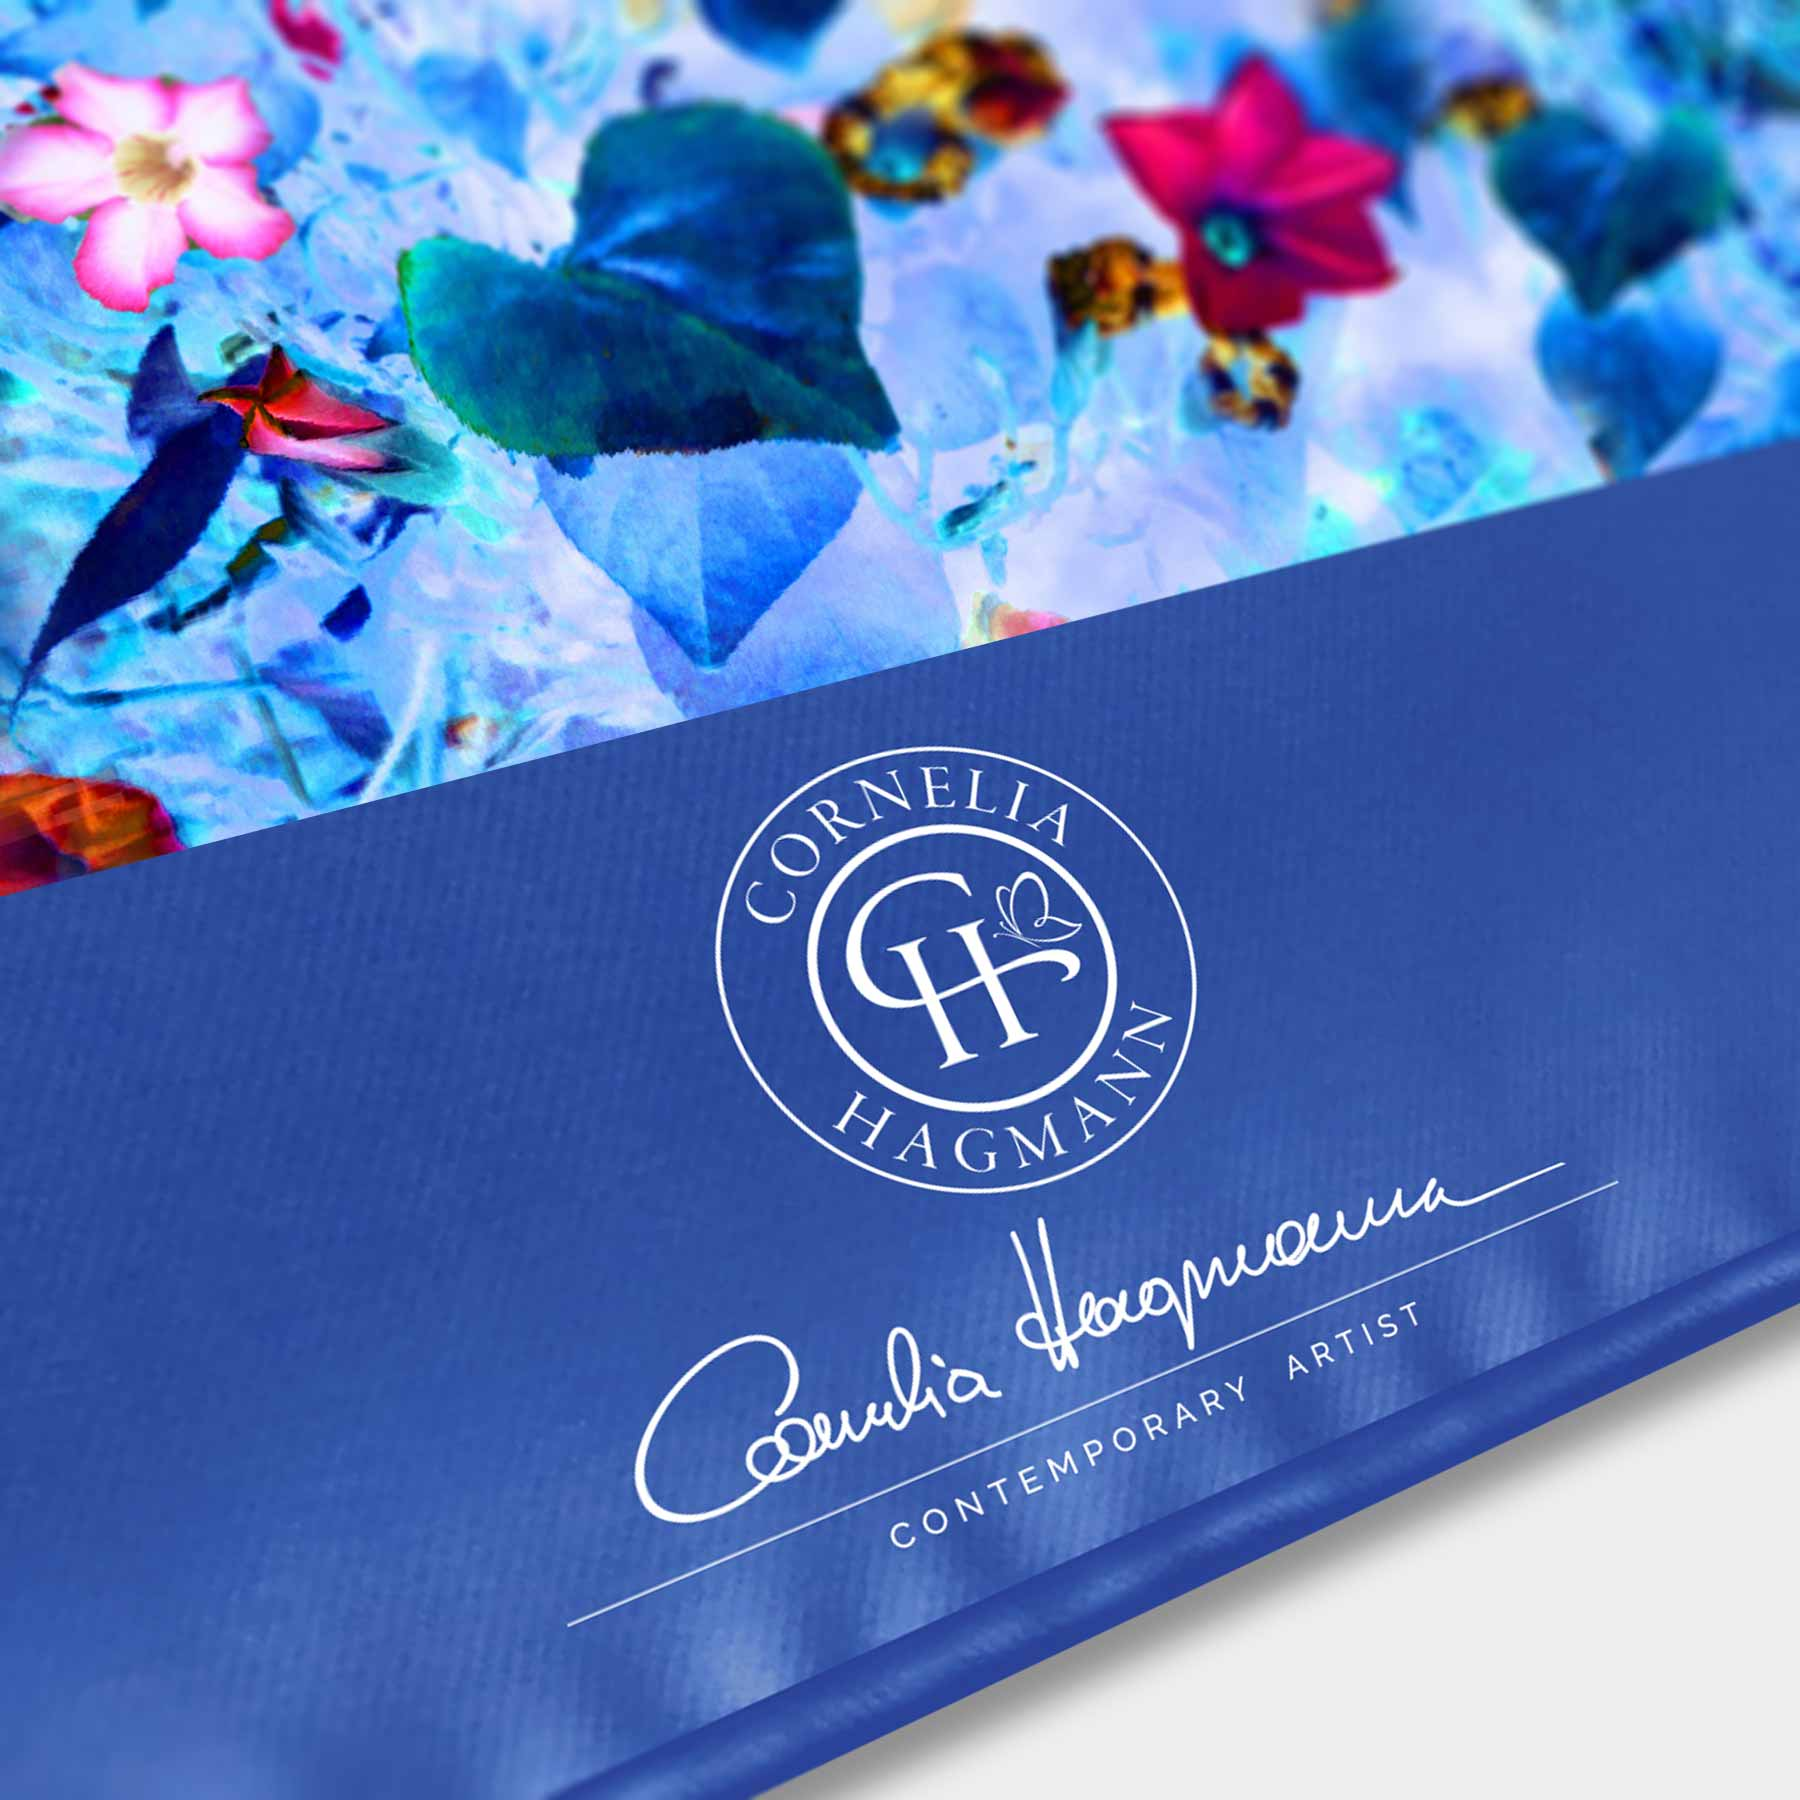 Cornelia Hagmann Silk Scarf Miracle Flowers La Galleria Detail Border, Seidenschal, sciarpa di seta, foulard soie,